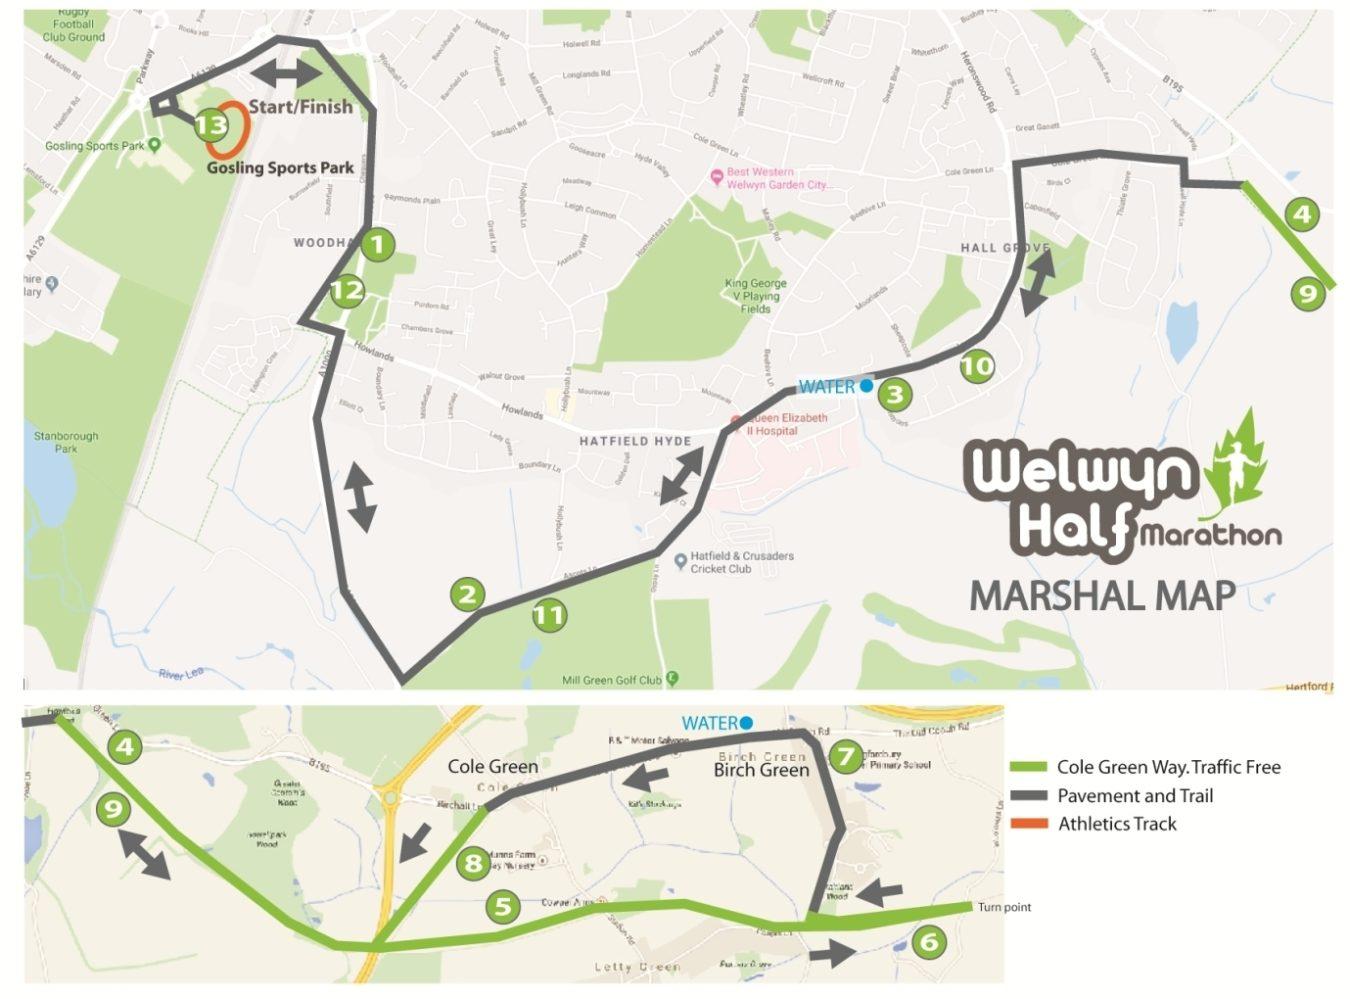 Whm Map 2018